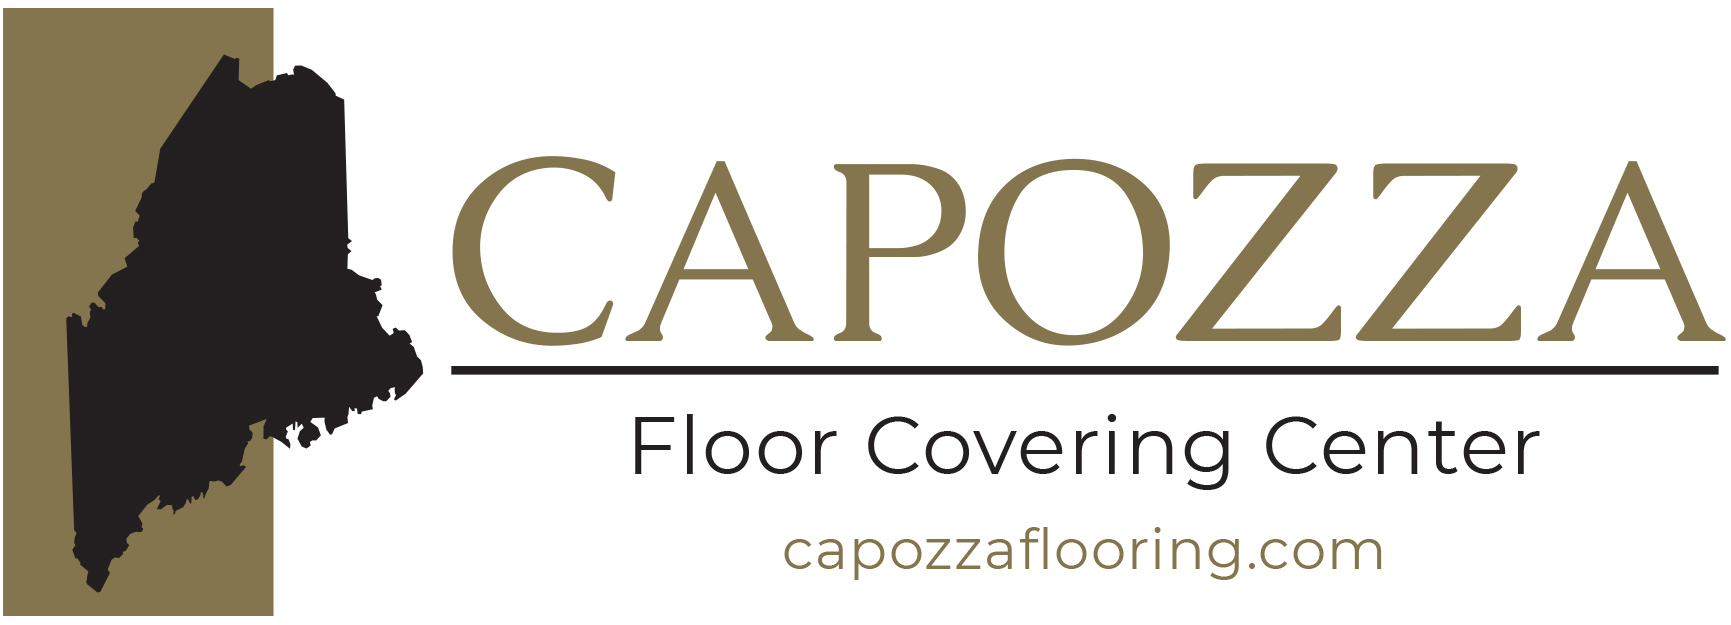 Capozza Flooring D24 Costume Hour Sponsor 2021